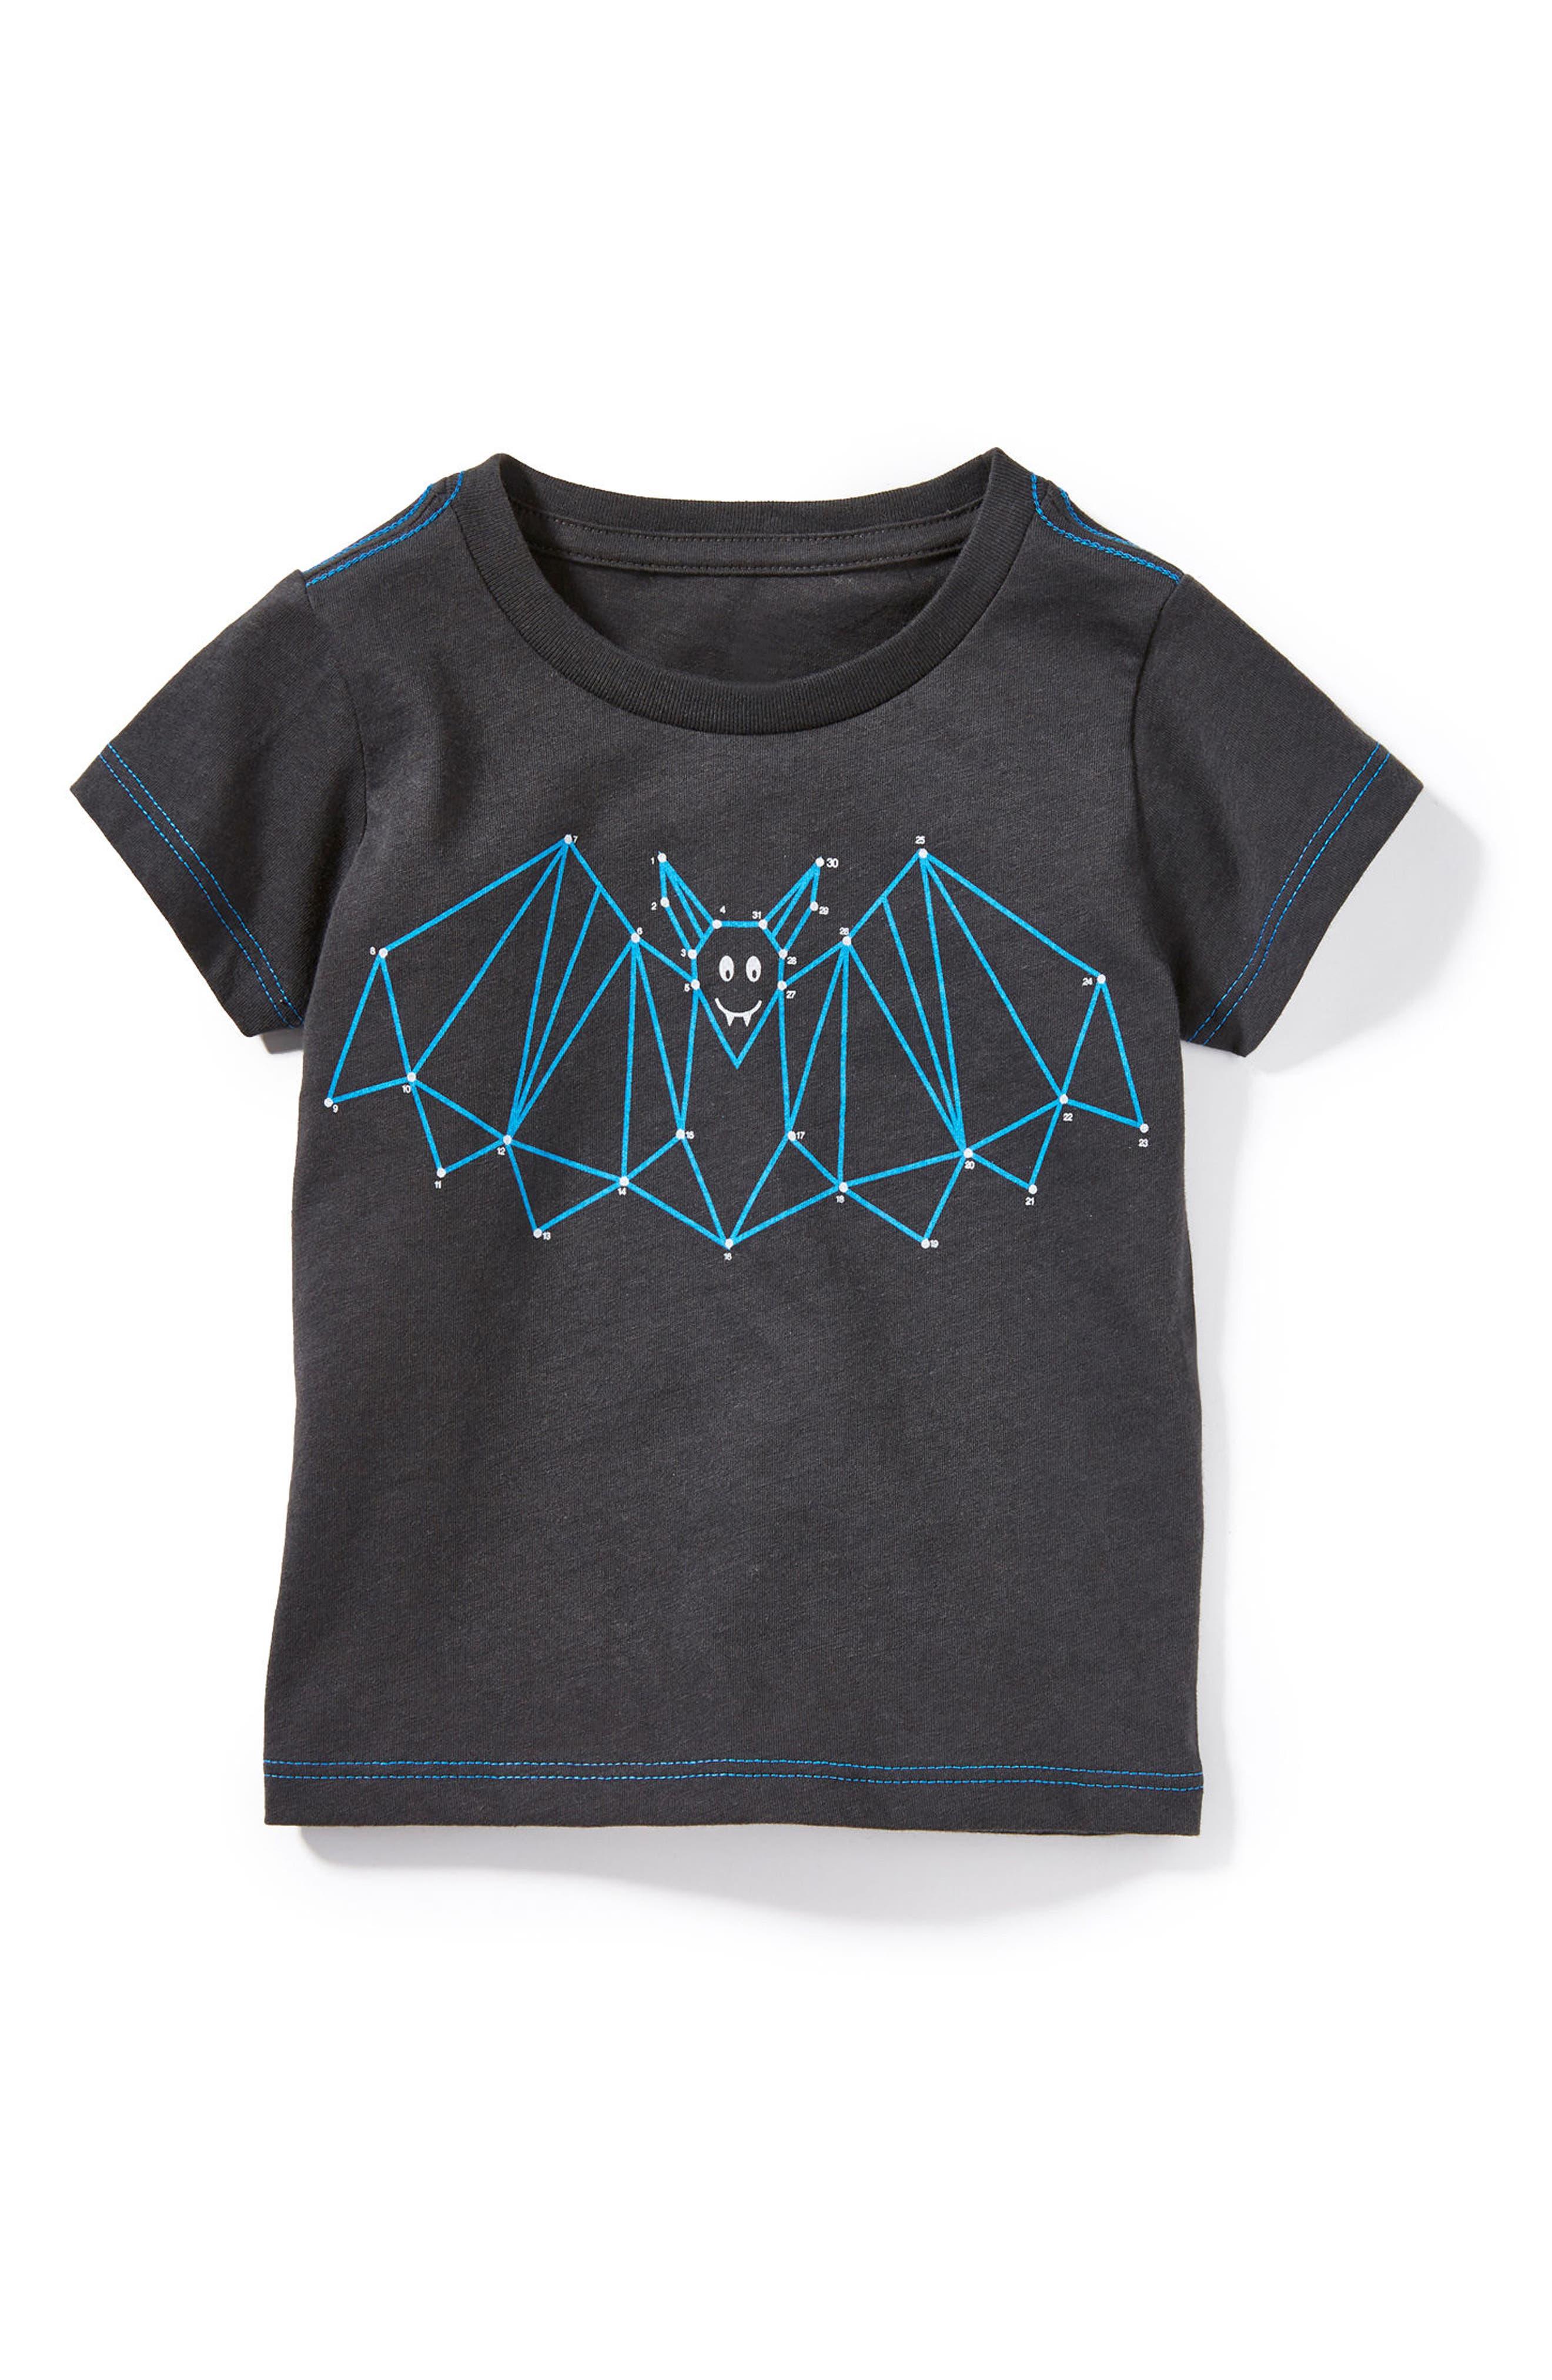 Main Image - Peek Bat Graphic T-Shirt (Baby Boys)